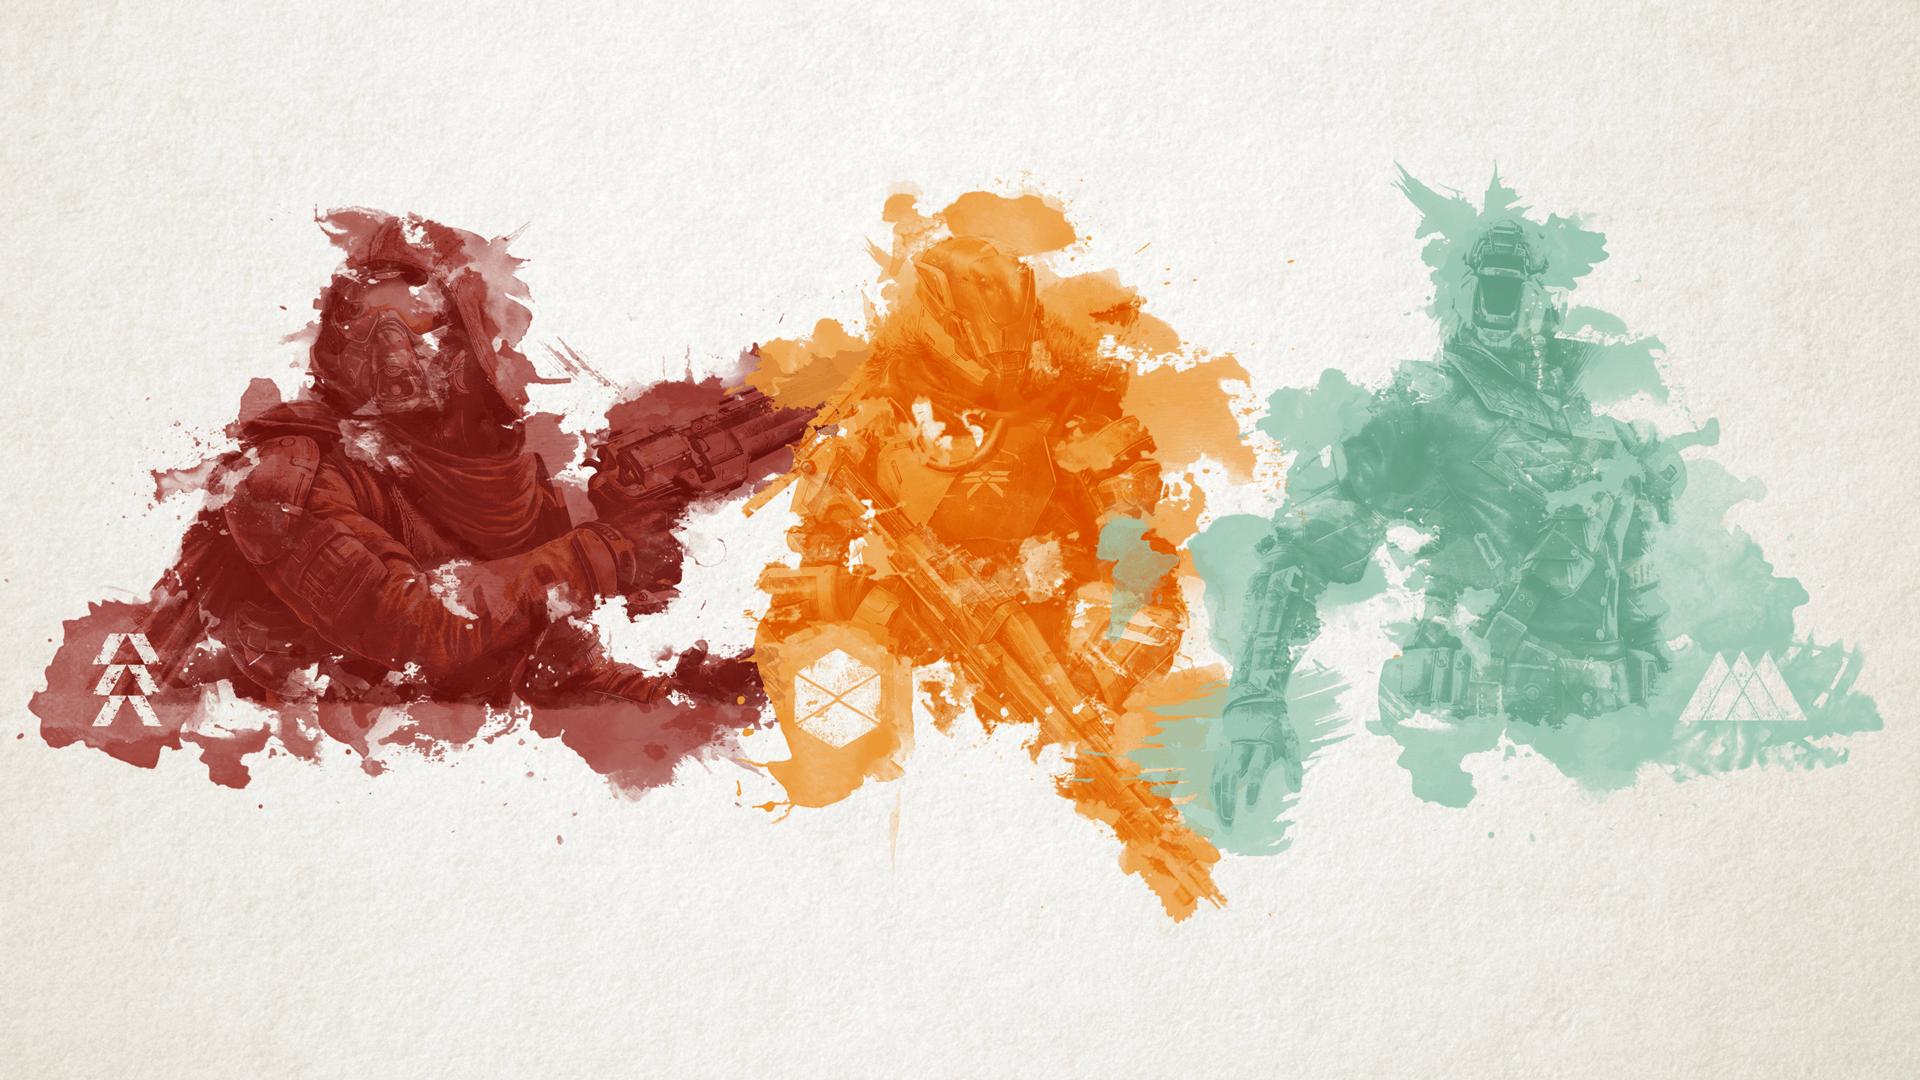 50 amazing destiny hd wallpapers for desktop free